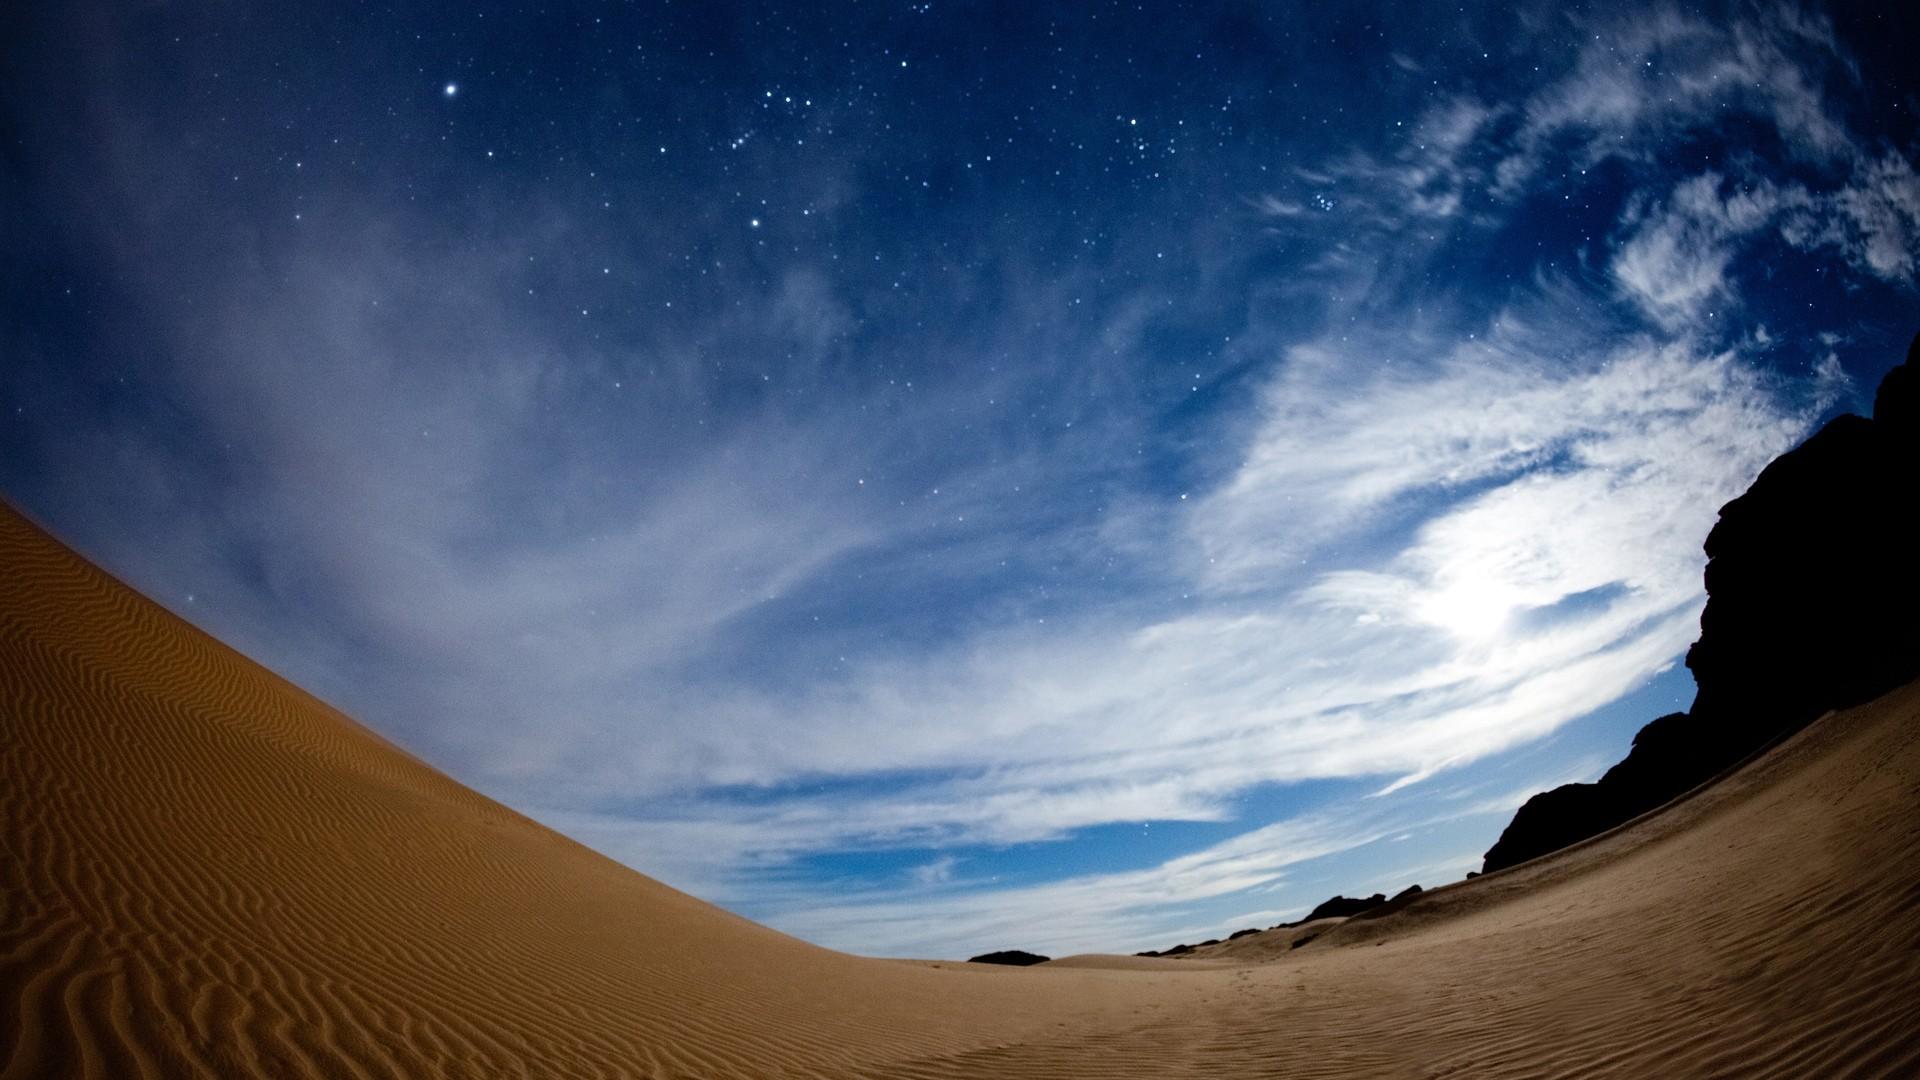 Sahara HD Wallpaper